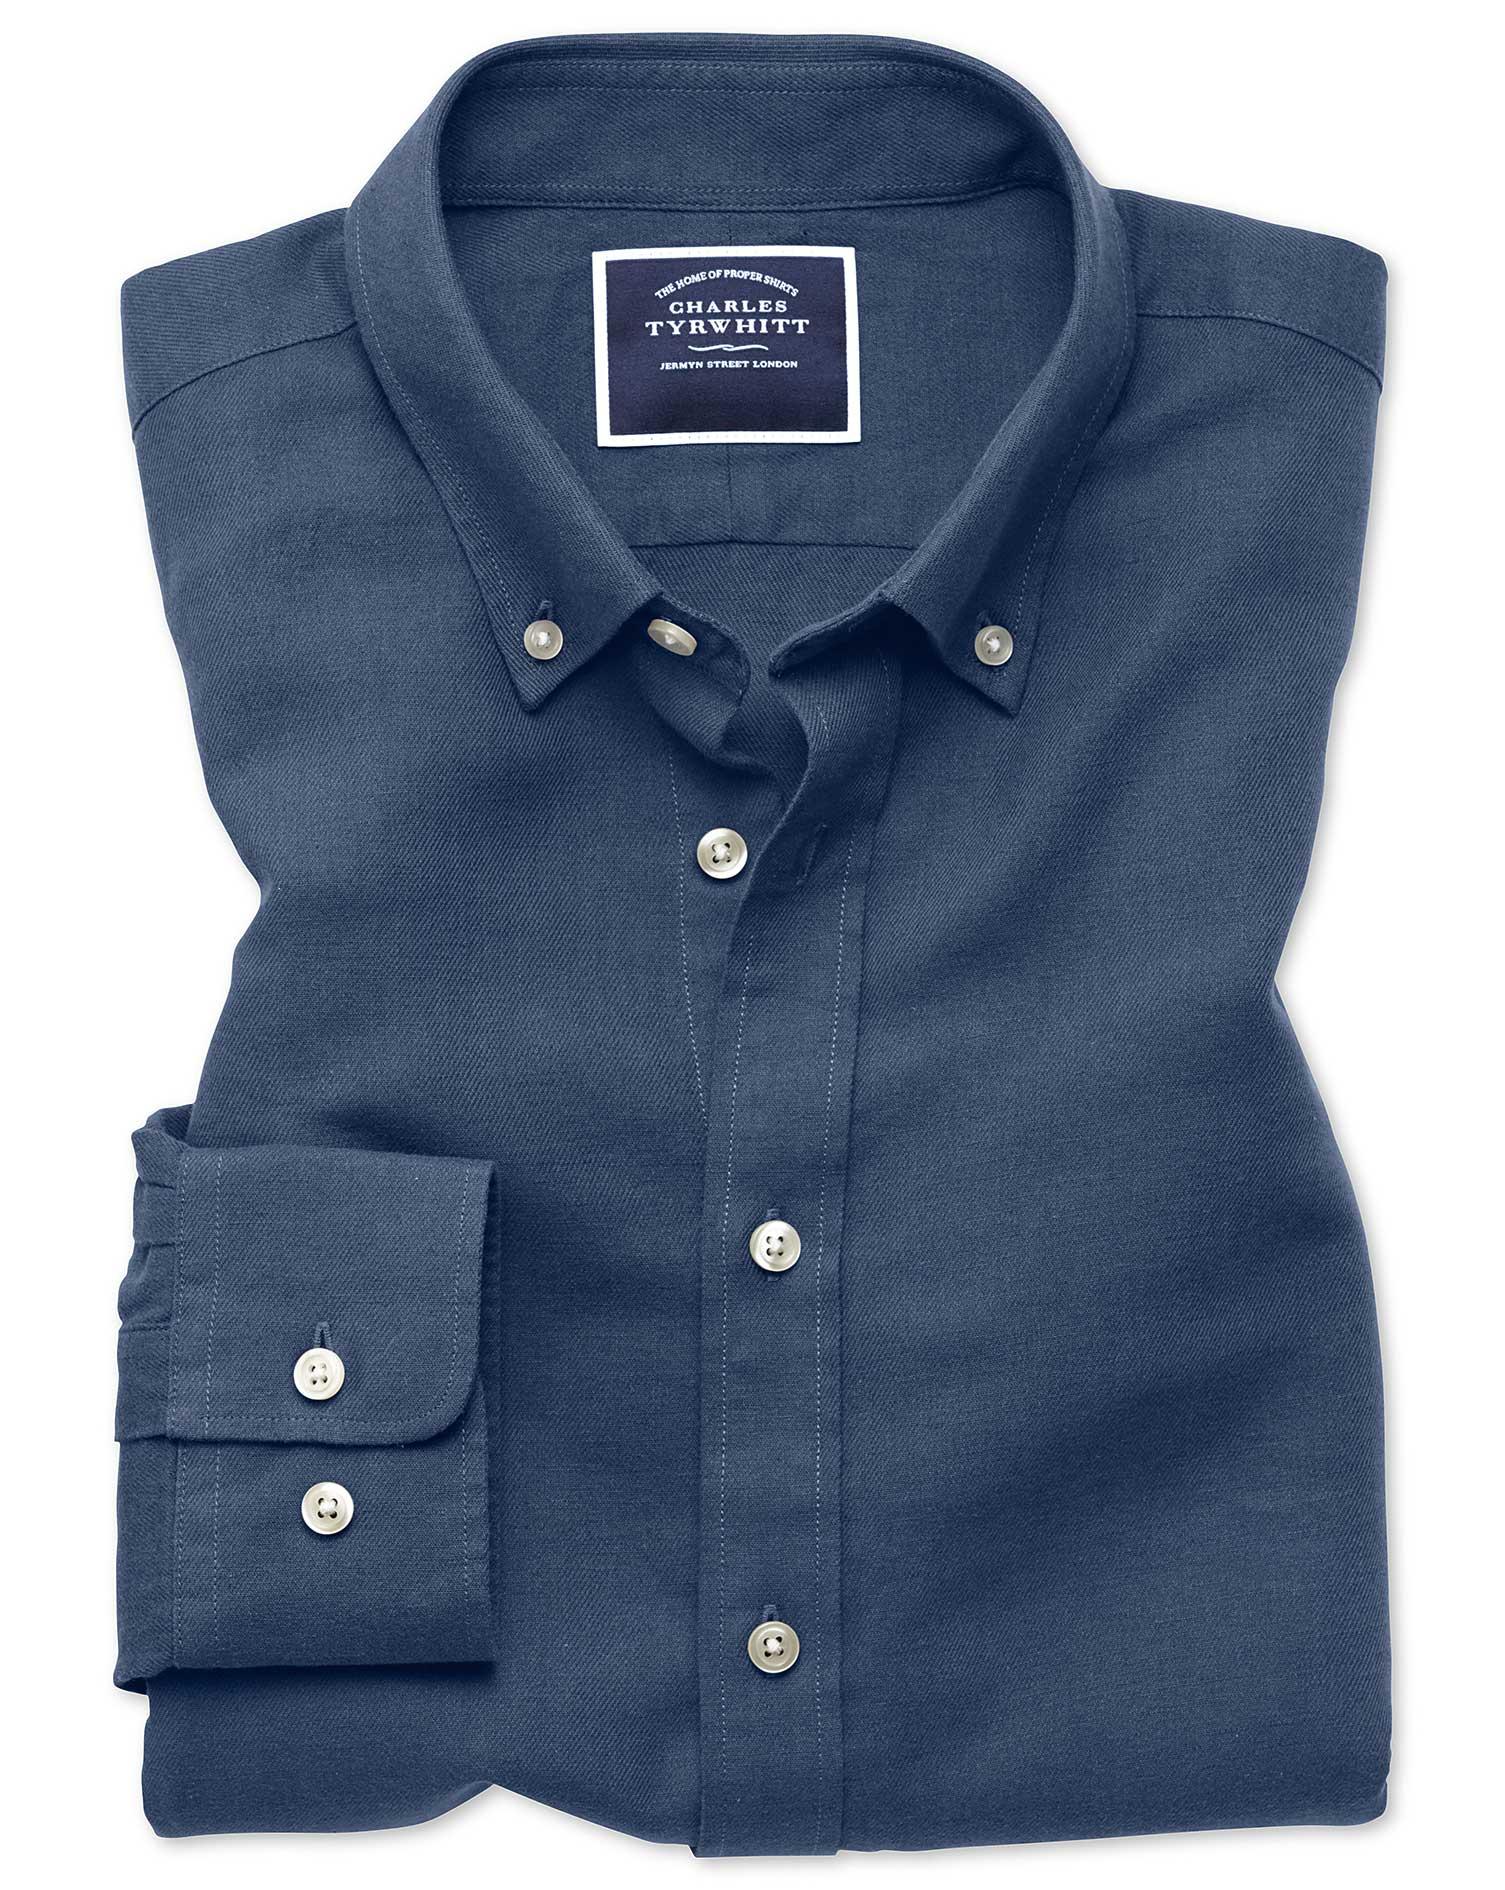 Slim Fit Dark Blue Cotton Linen Twill Shirt Single Cuff Size XXL by Charles Tyrwhitt